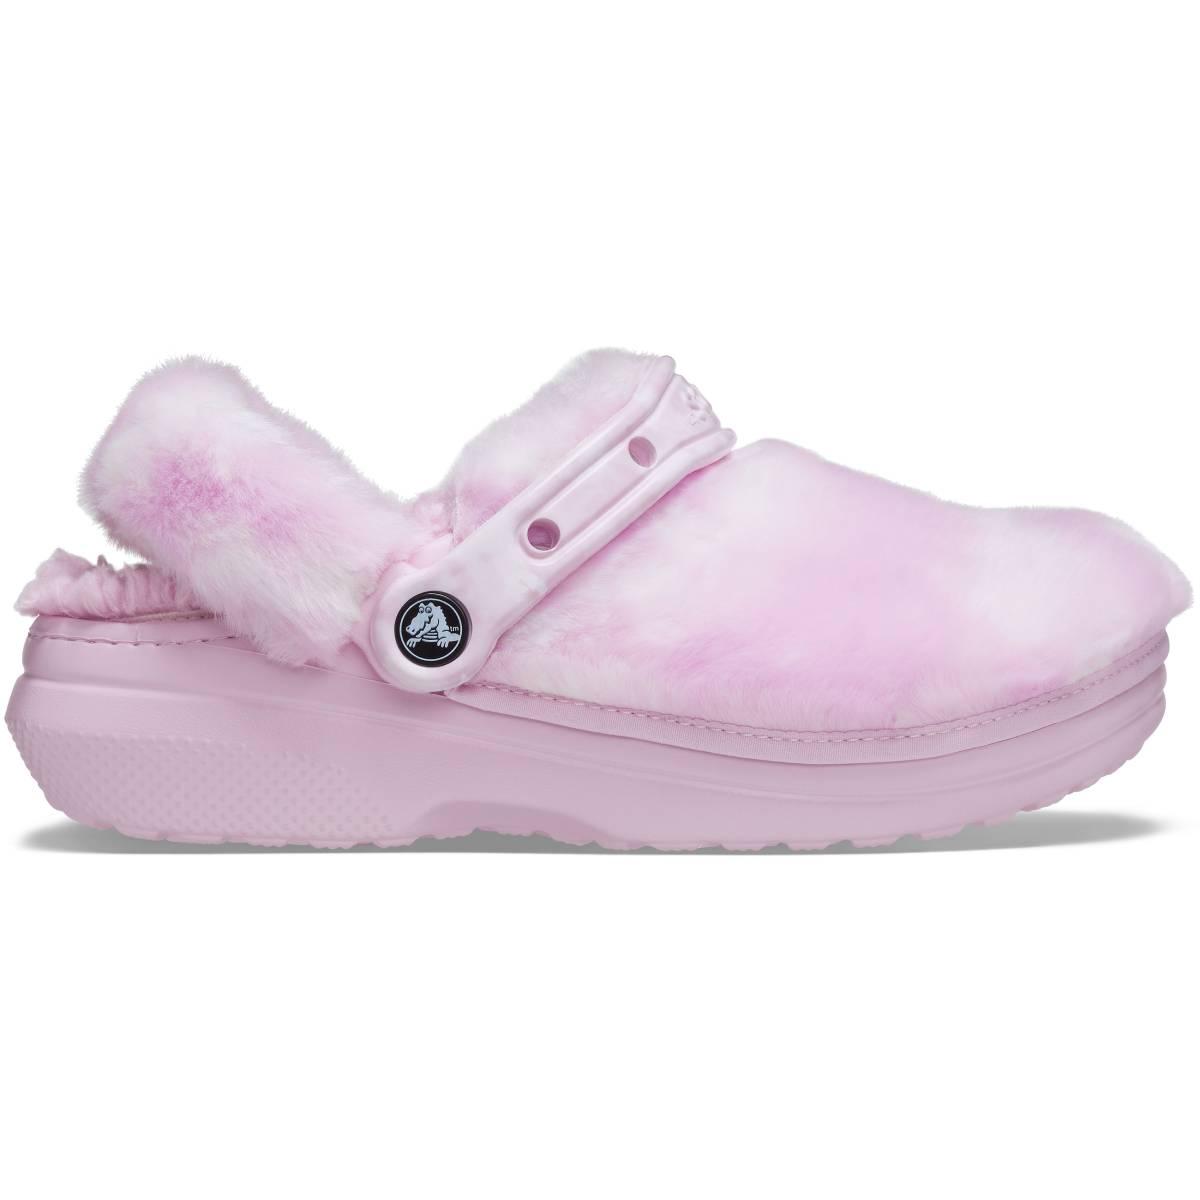 Classic Fur Sure - Ballerina Pink/White